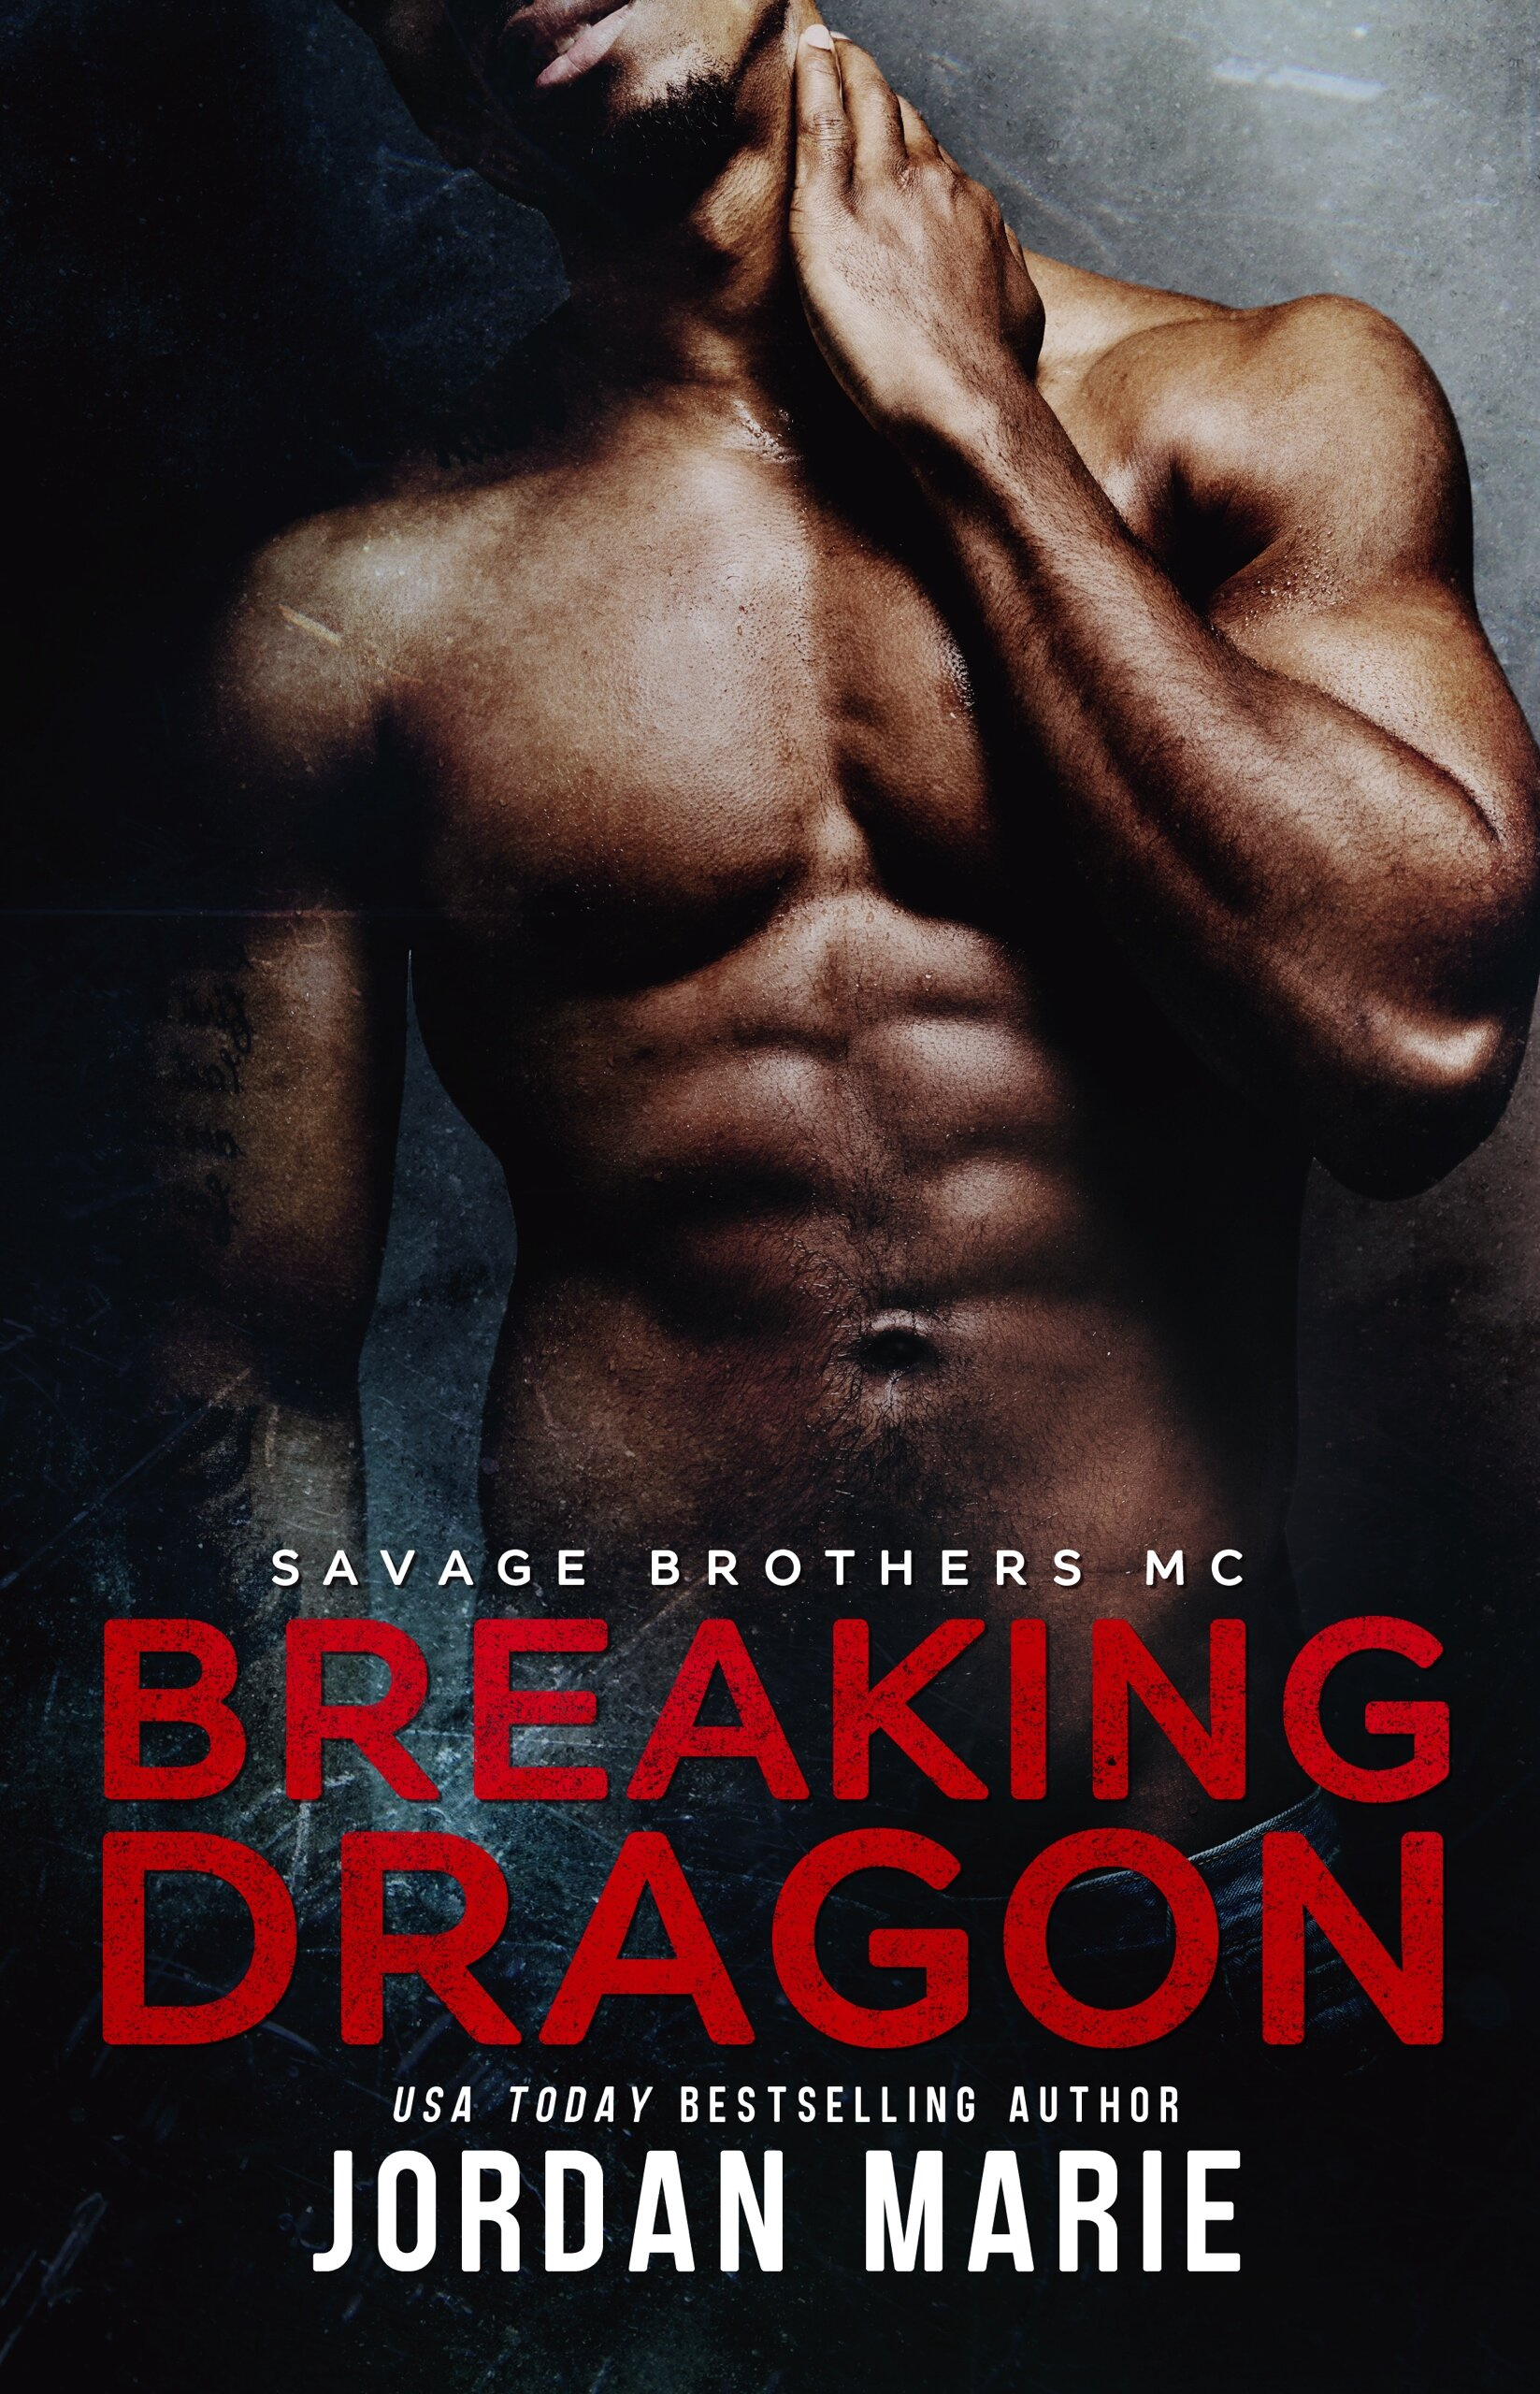 Savage Brothers Mc Jordan Marie Romance